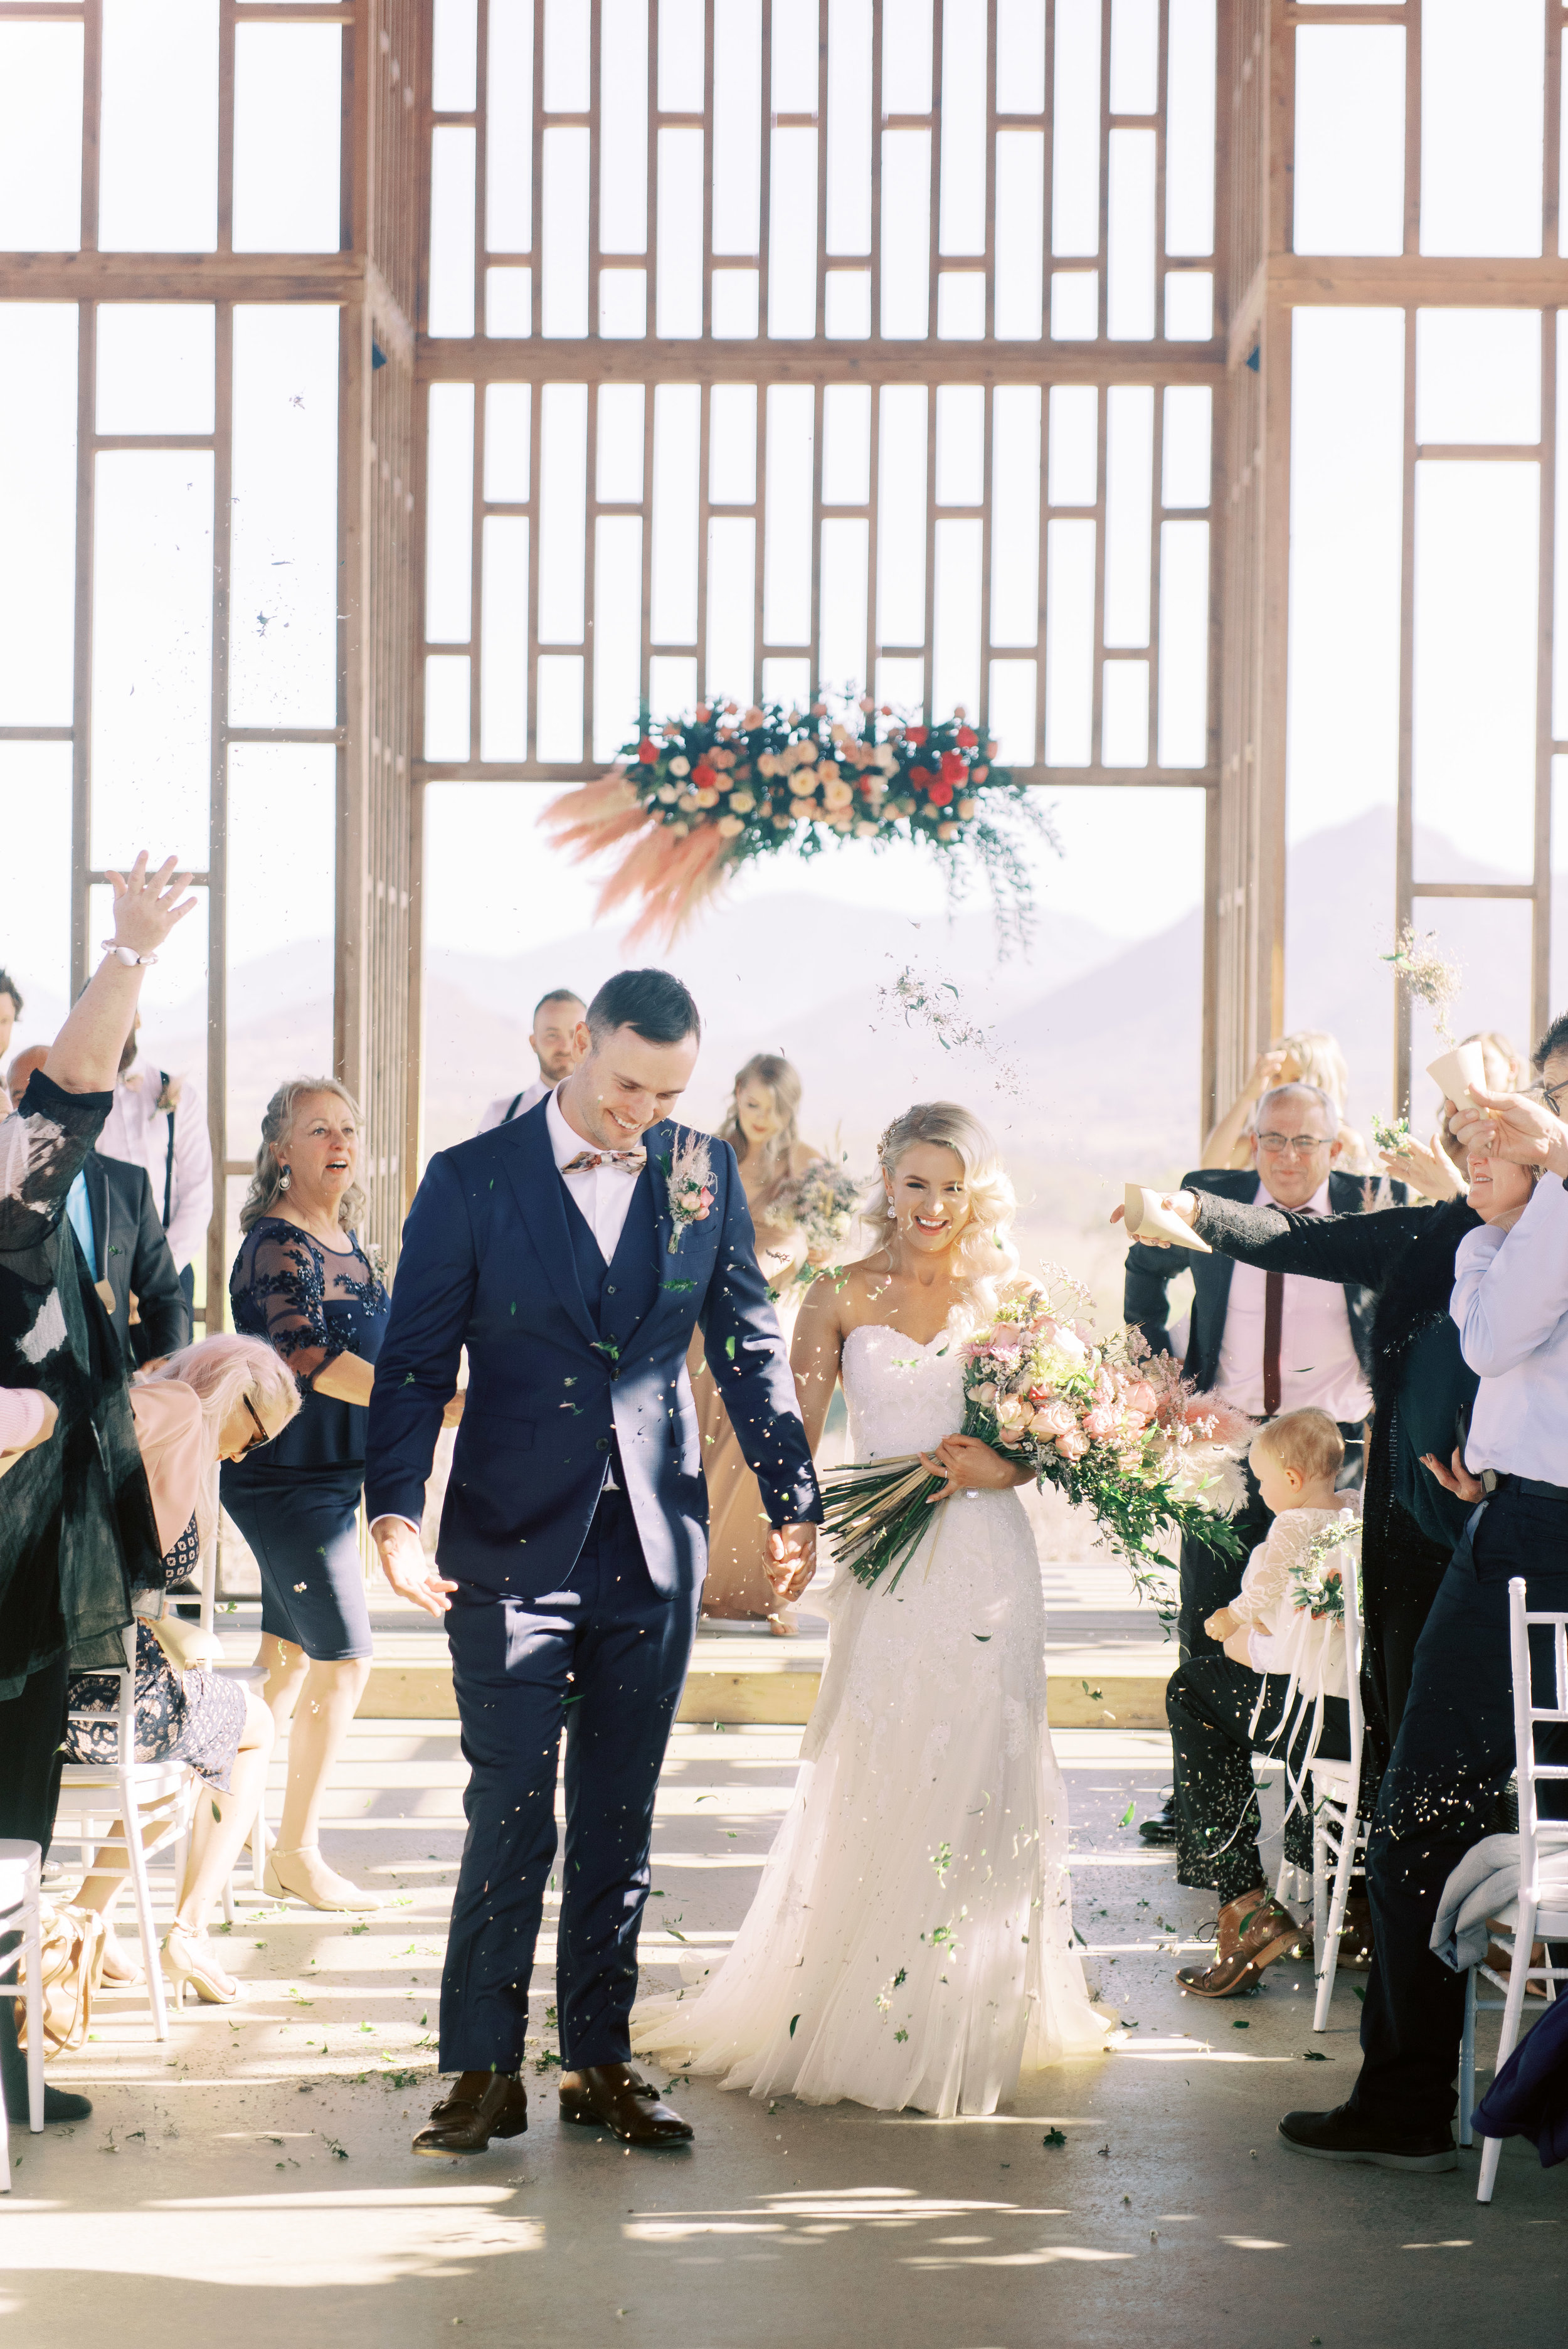 Kooroomba-Vineyard-Lavender-Farm-Wedding-Fine-Art-Lauren-Olivia-45.jpg